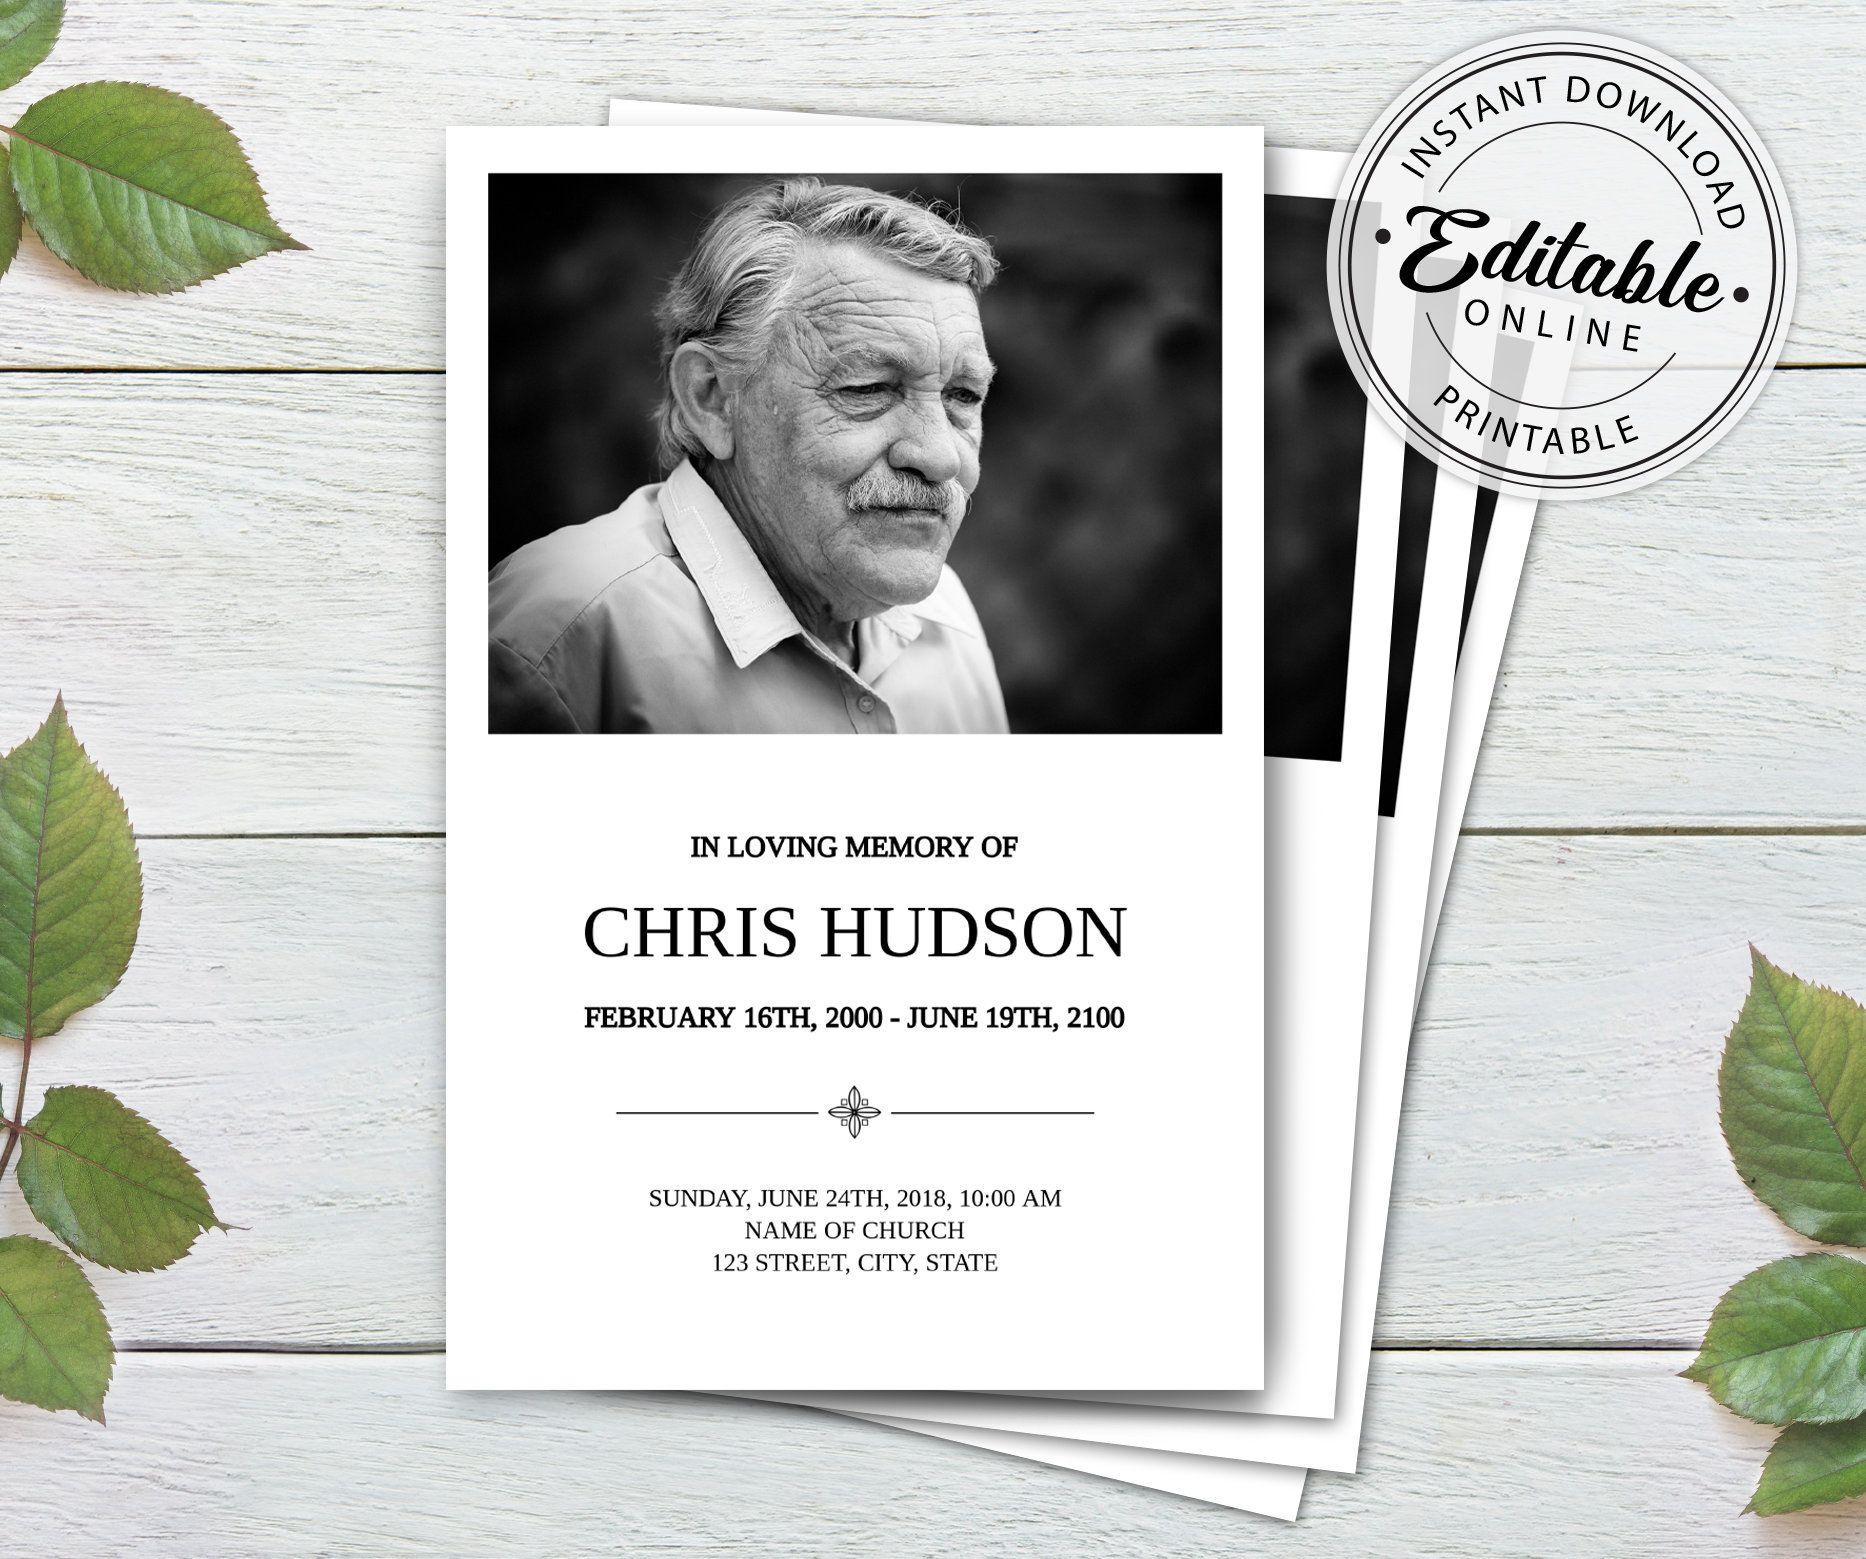 Death ceremony invitation template – Artofit With Death Anniversary Cards Templates